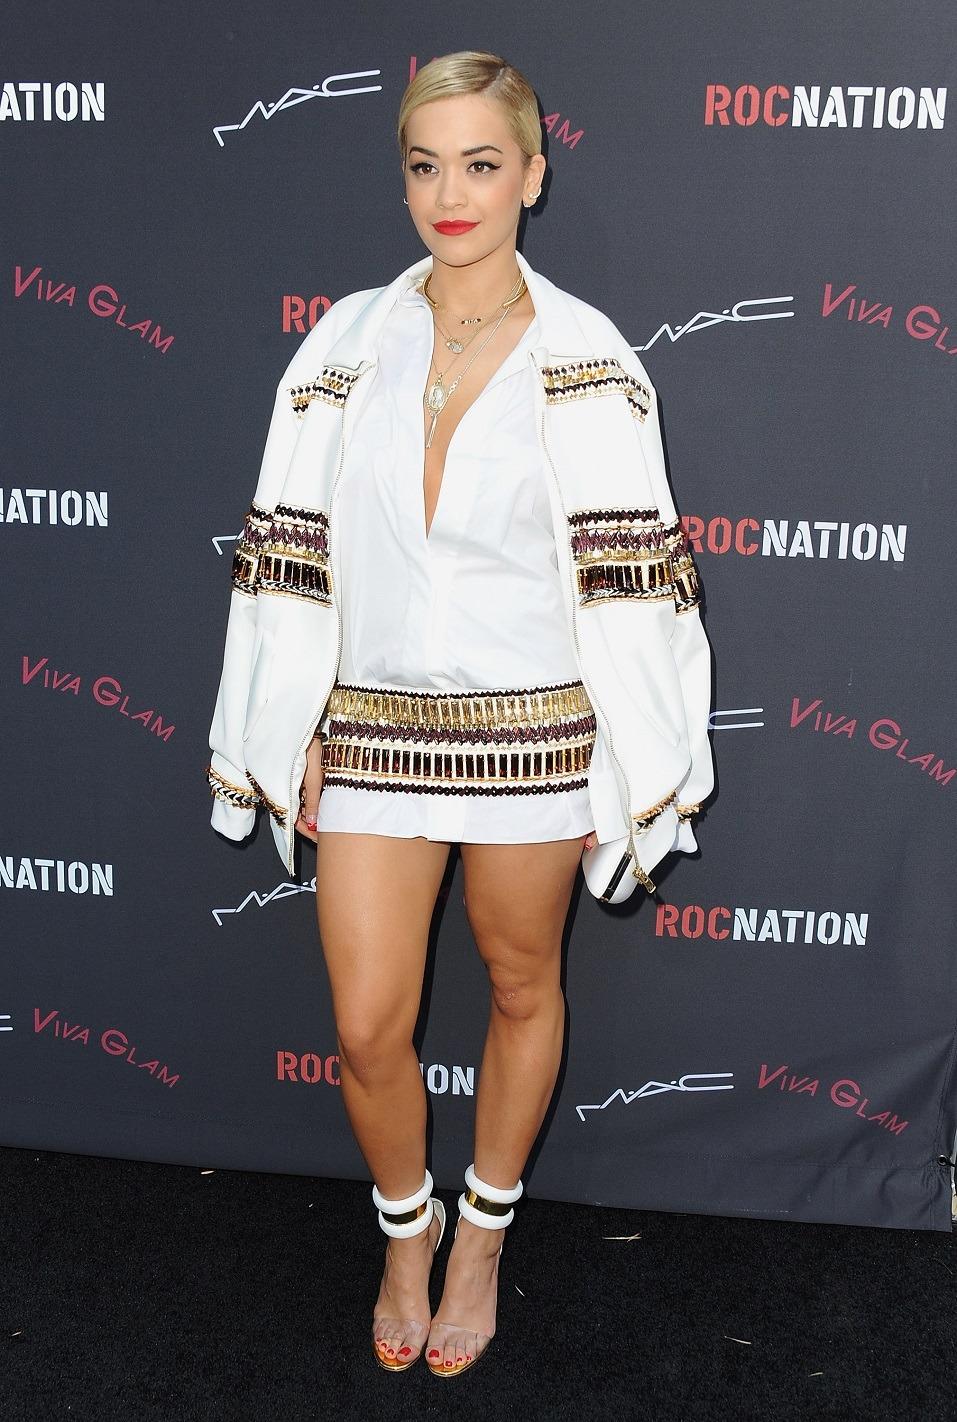 Singer/songwriter Rita Ora arrives at the Roc Nation